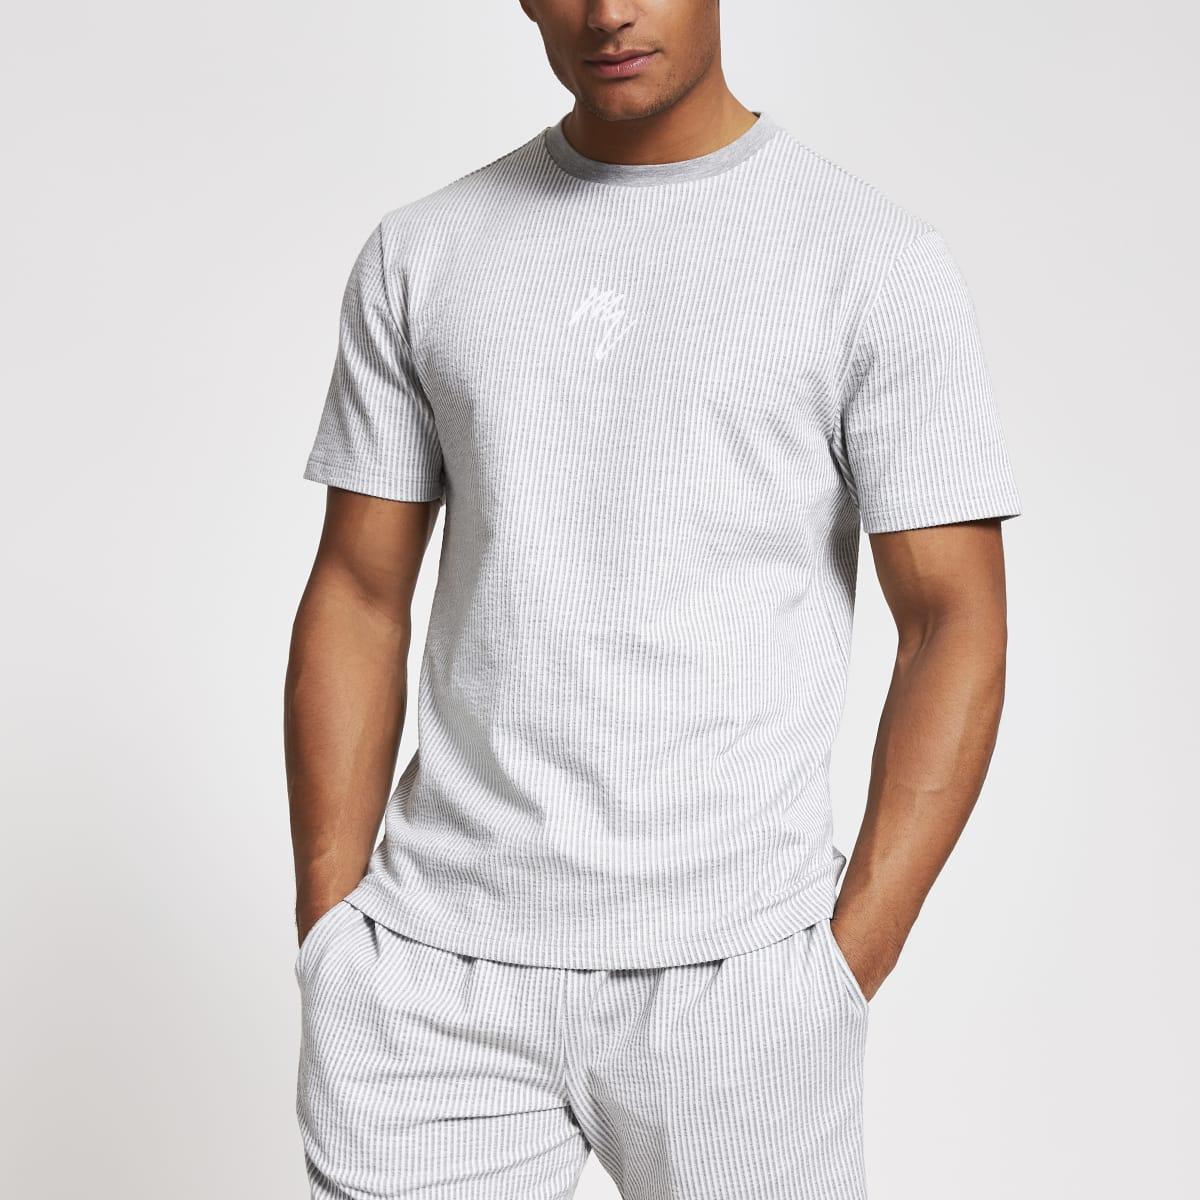 Maison Riviera - Grijs gestreept slim-fit T-shirt